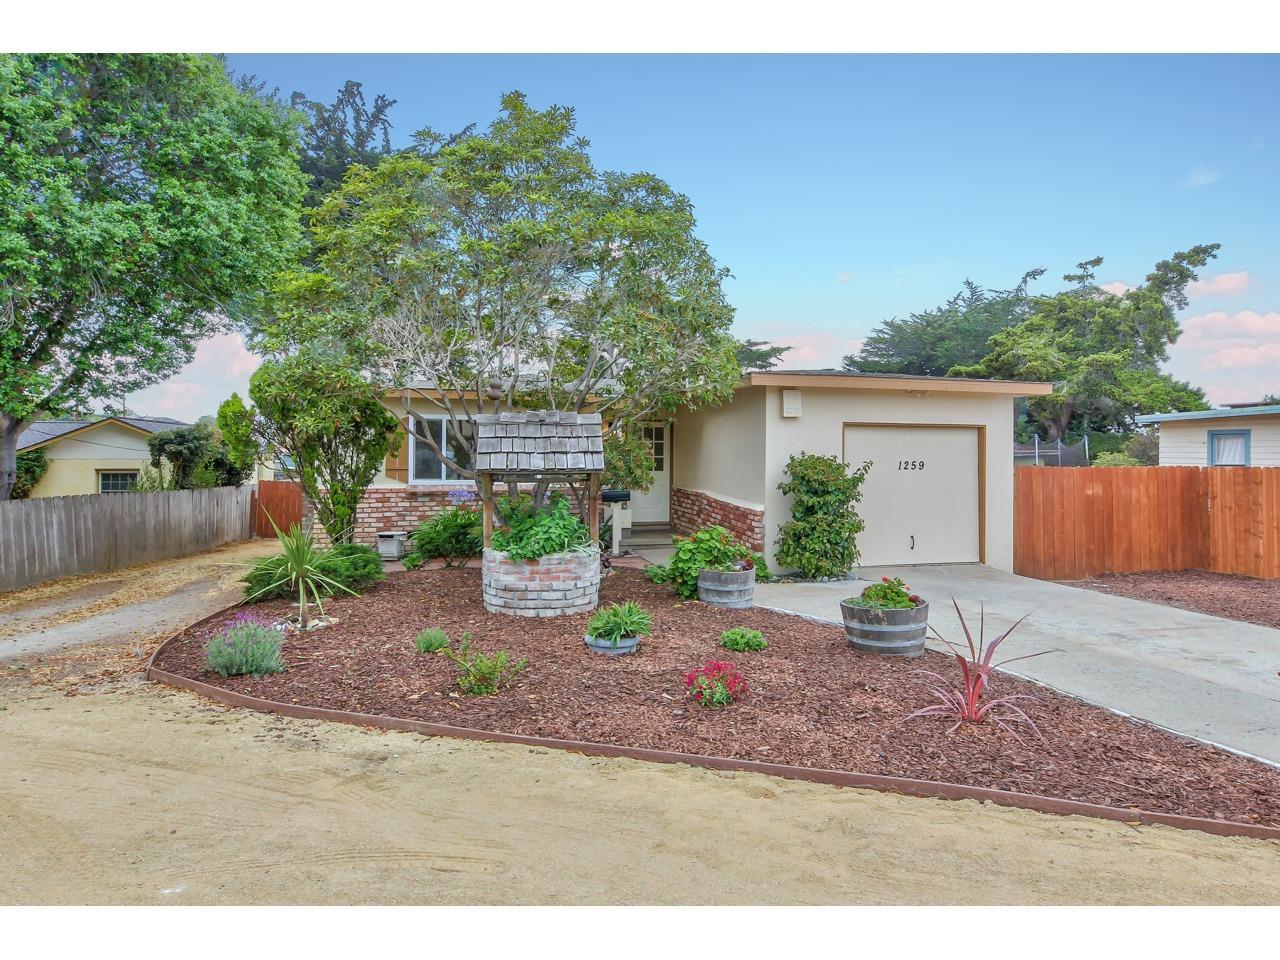 Photo of 1259 Prospect ST, SEASIDE, CA 93955